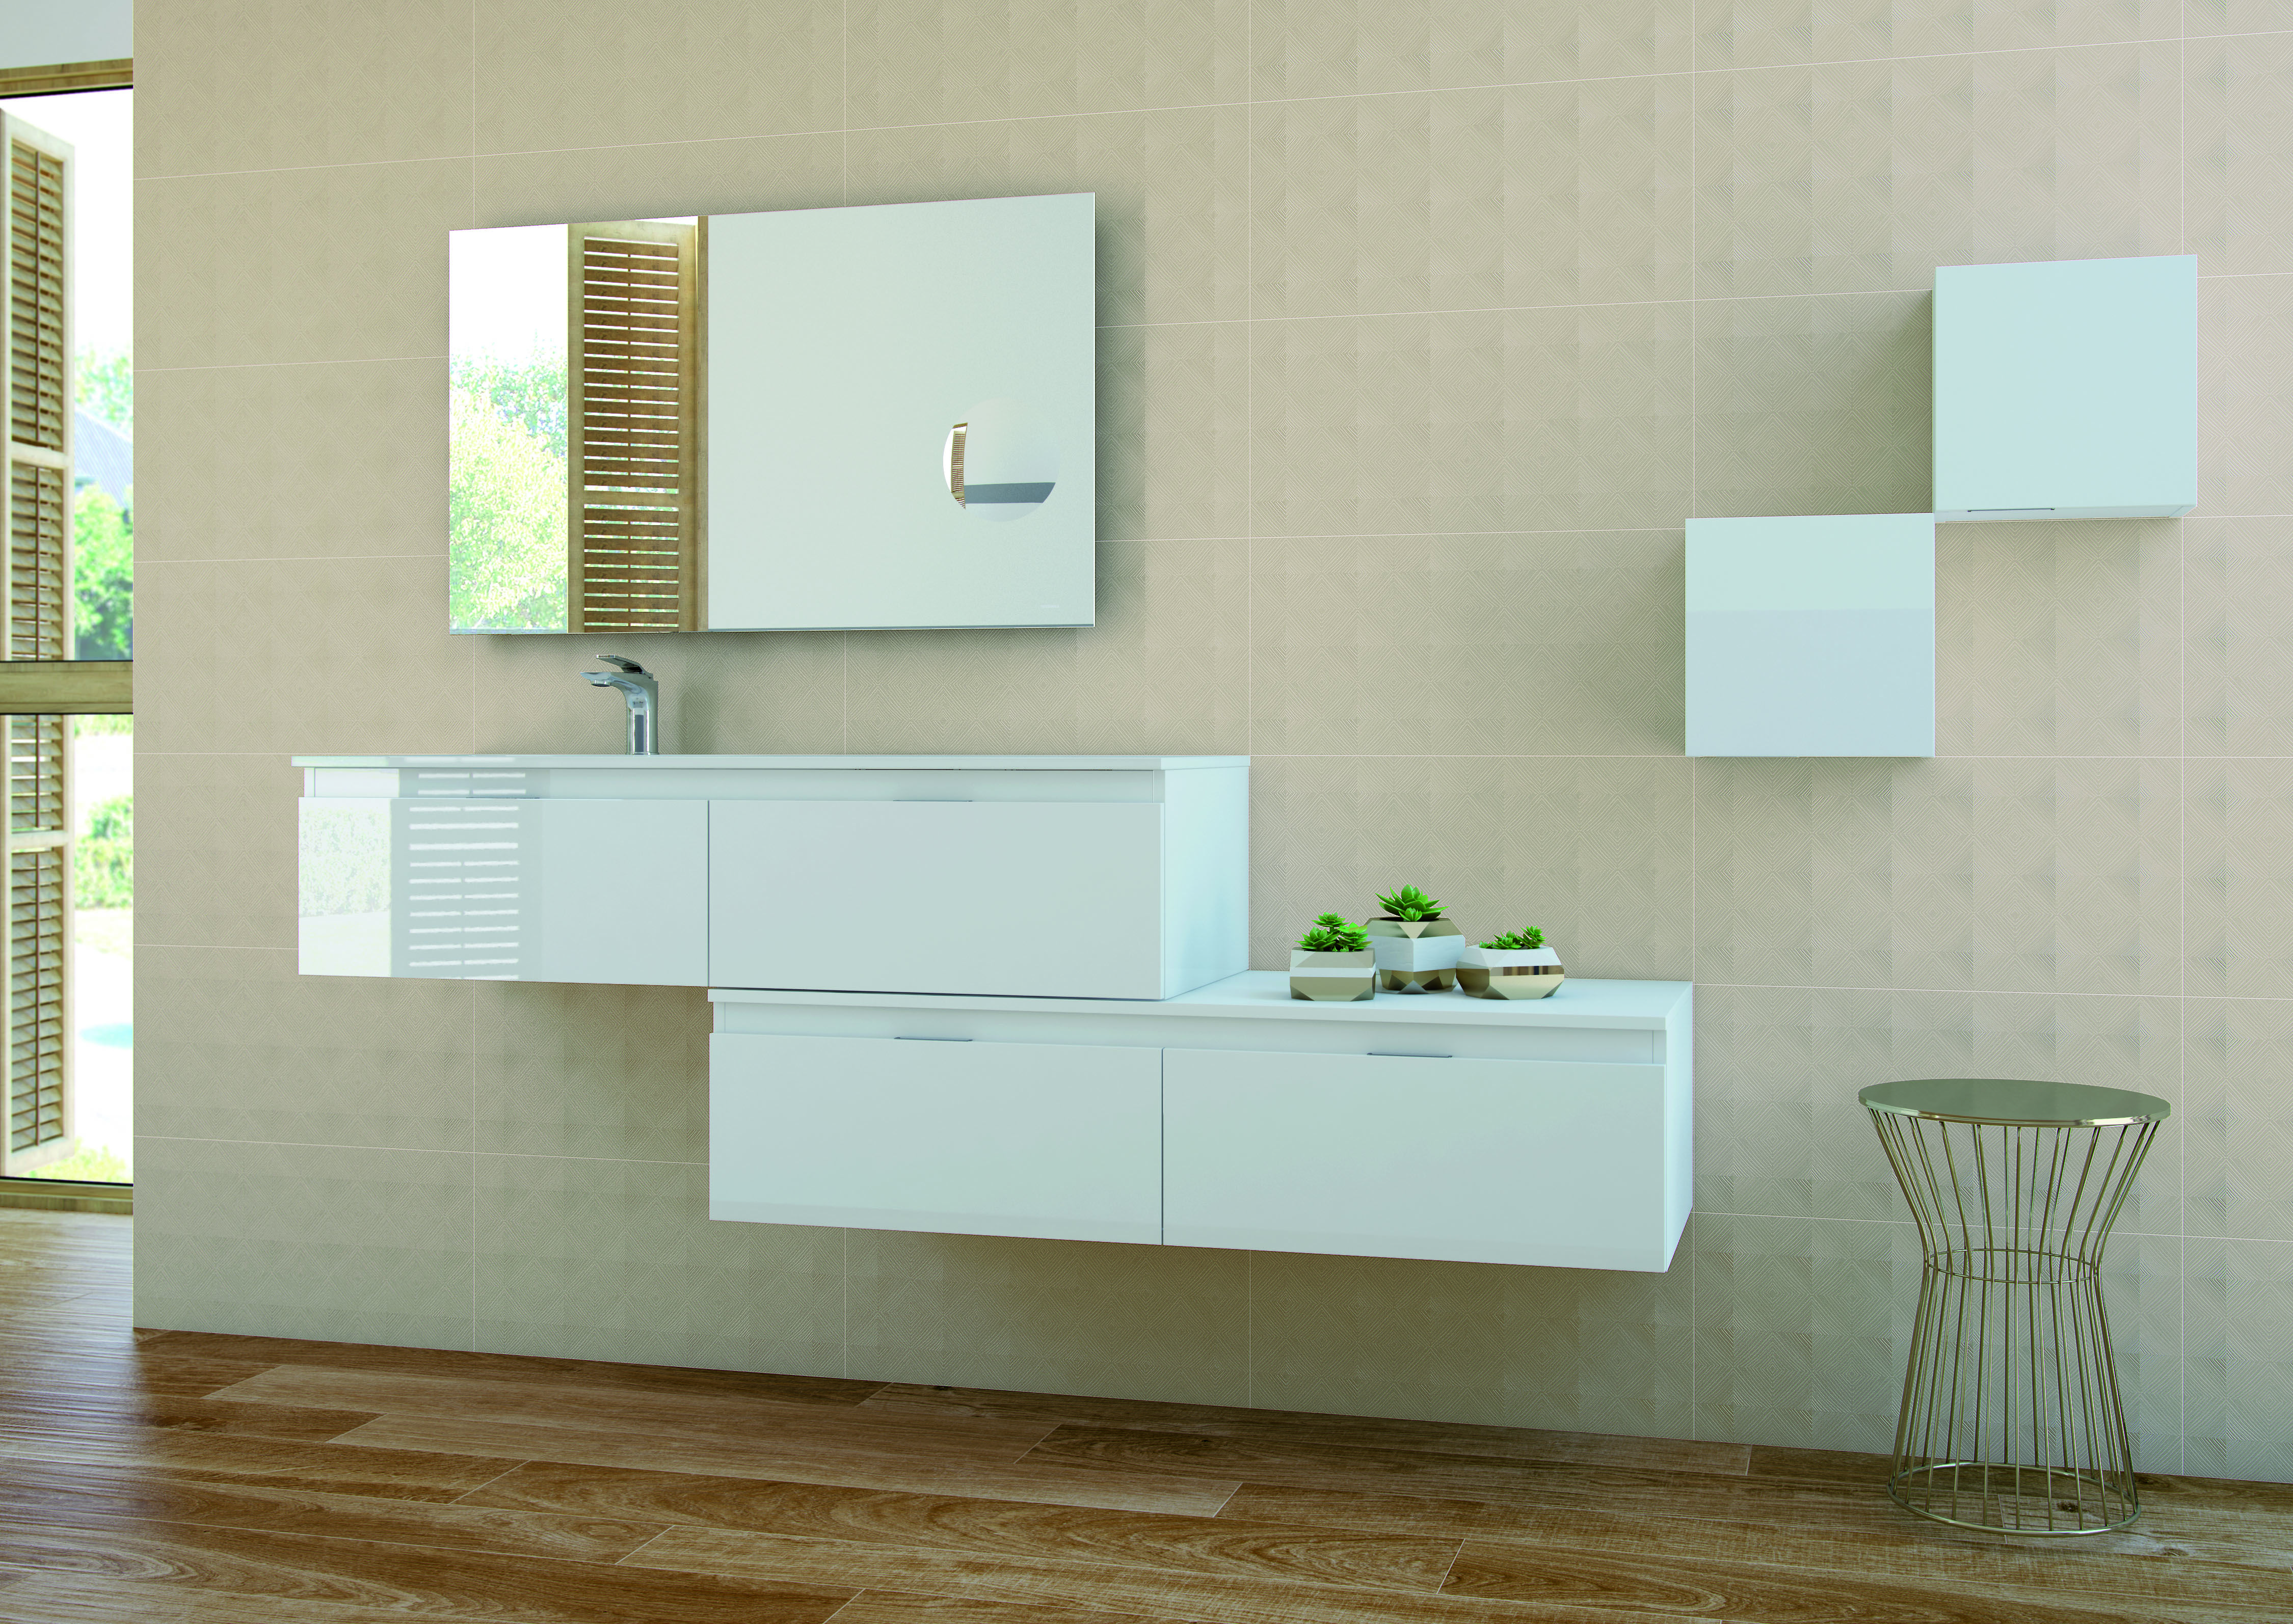 Serie Lipari Grespania Cer Mica Serie Aqua Mueble Ba O  # Muebles Ultramodernos